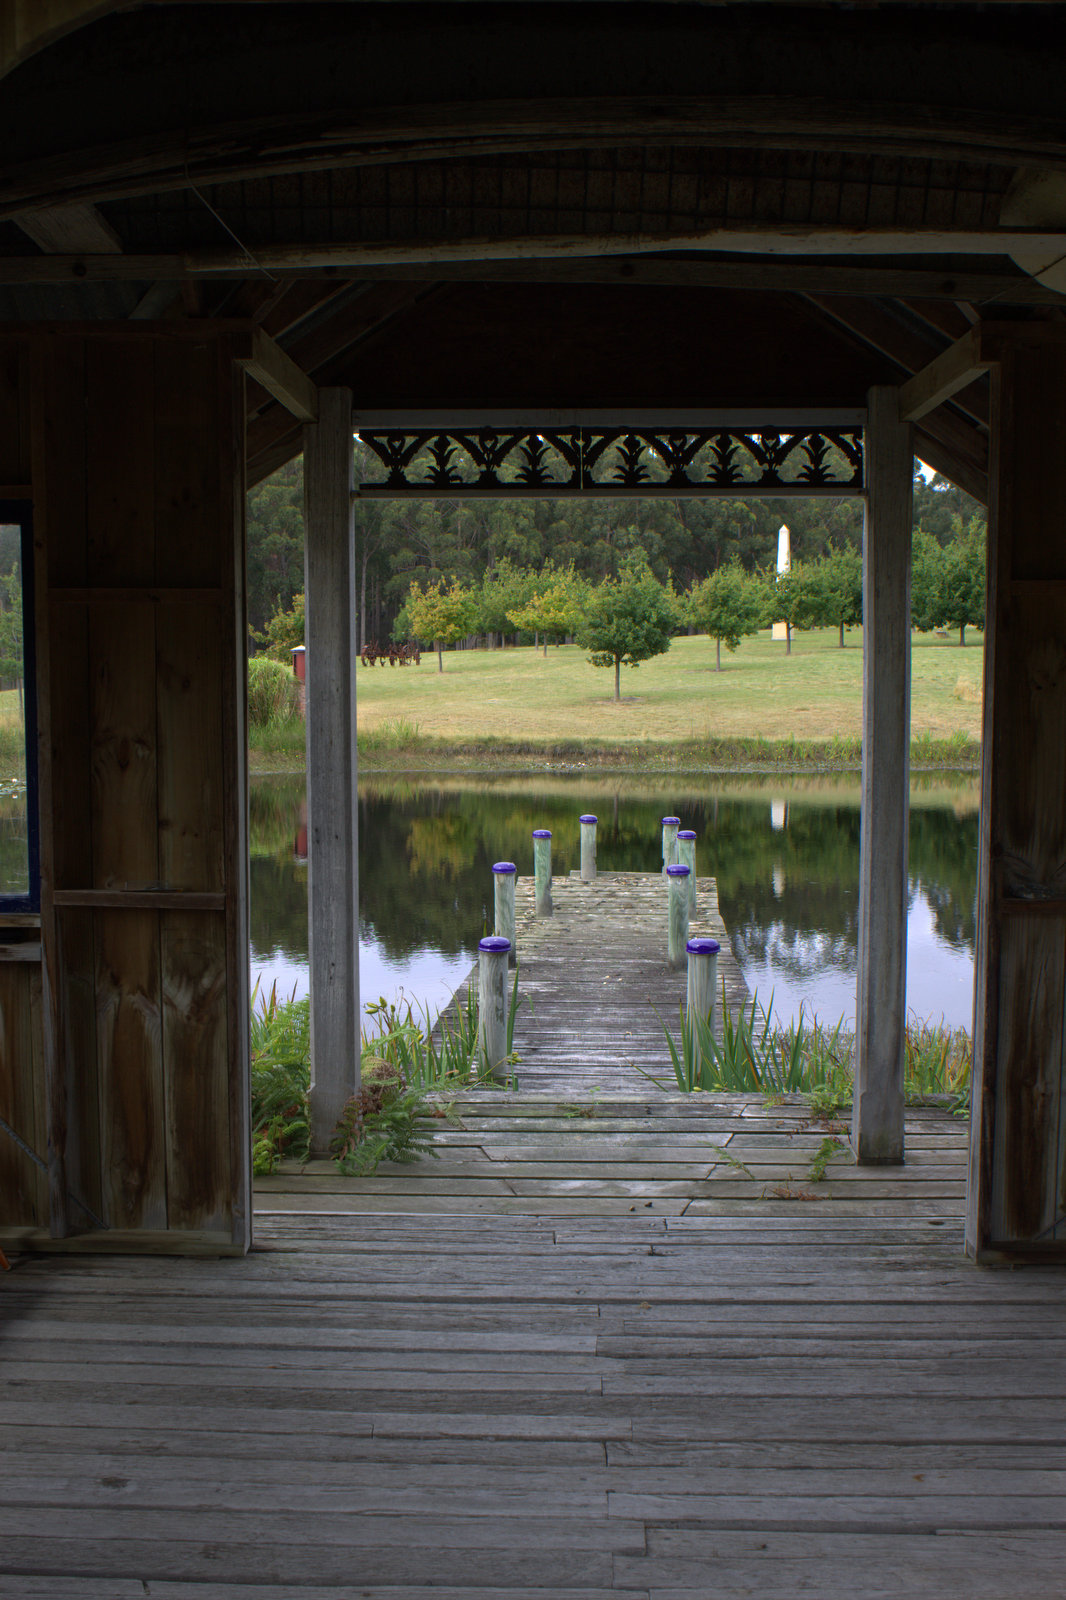 Explore the amazing private garden of Hiba with Adventure Trails Tasamania